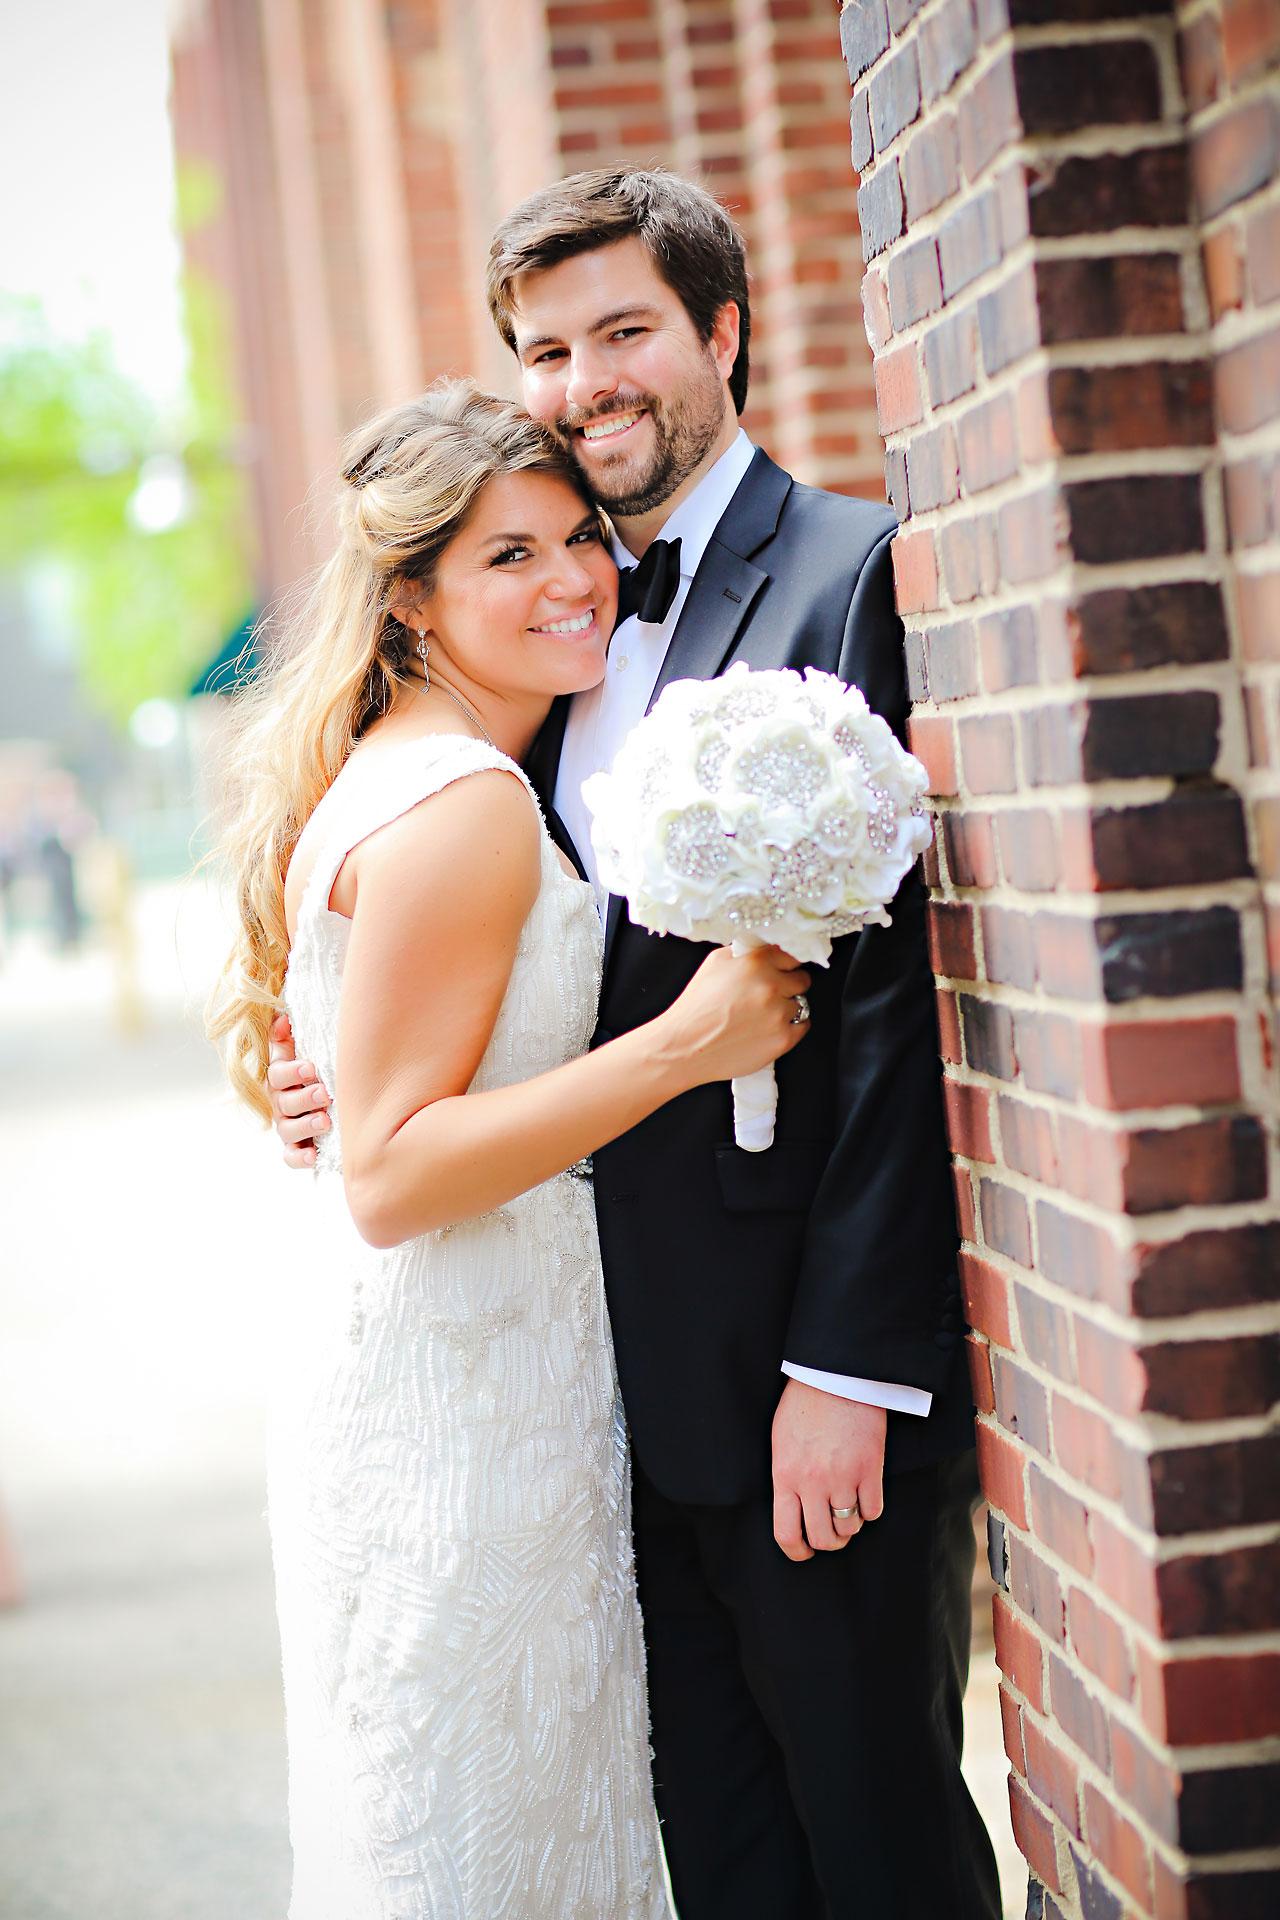 Amy Nick Canal 337 Wedding 147